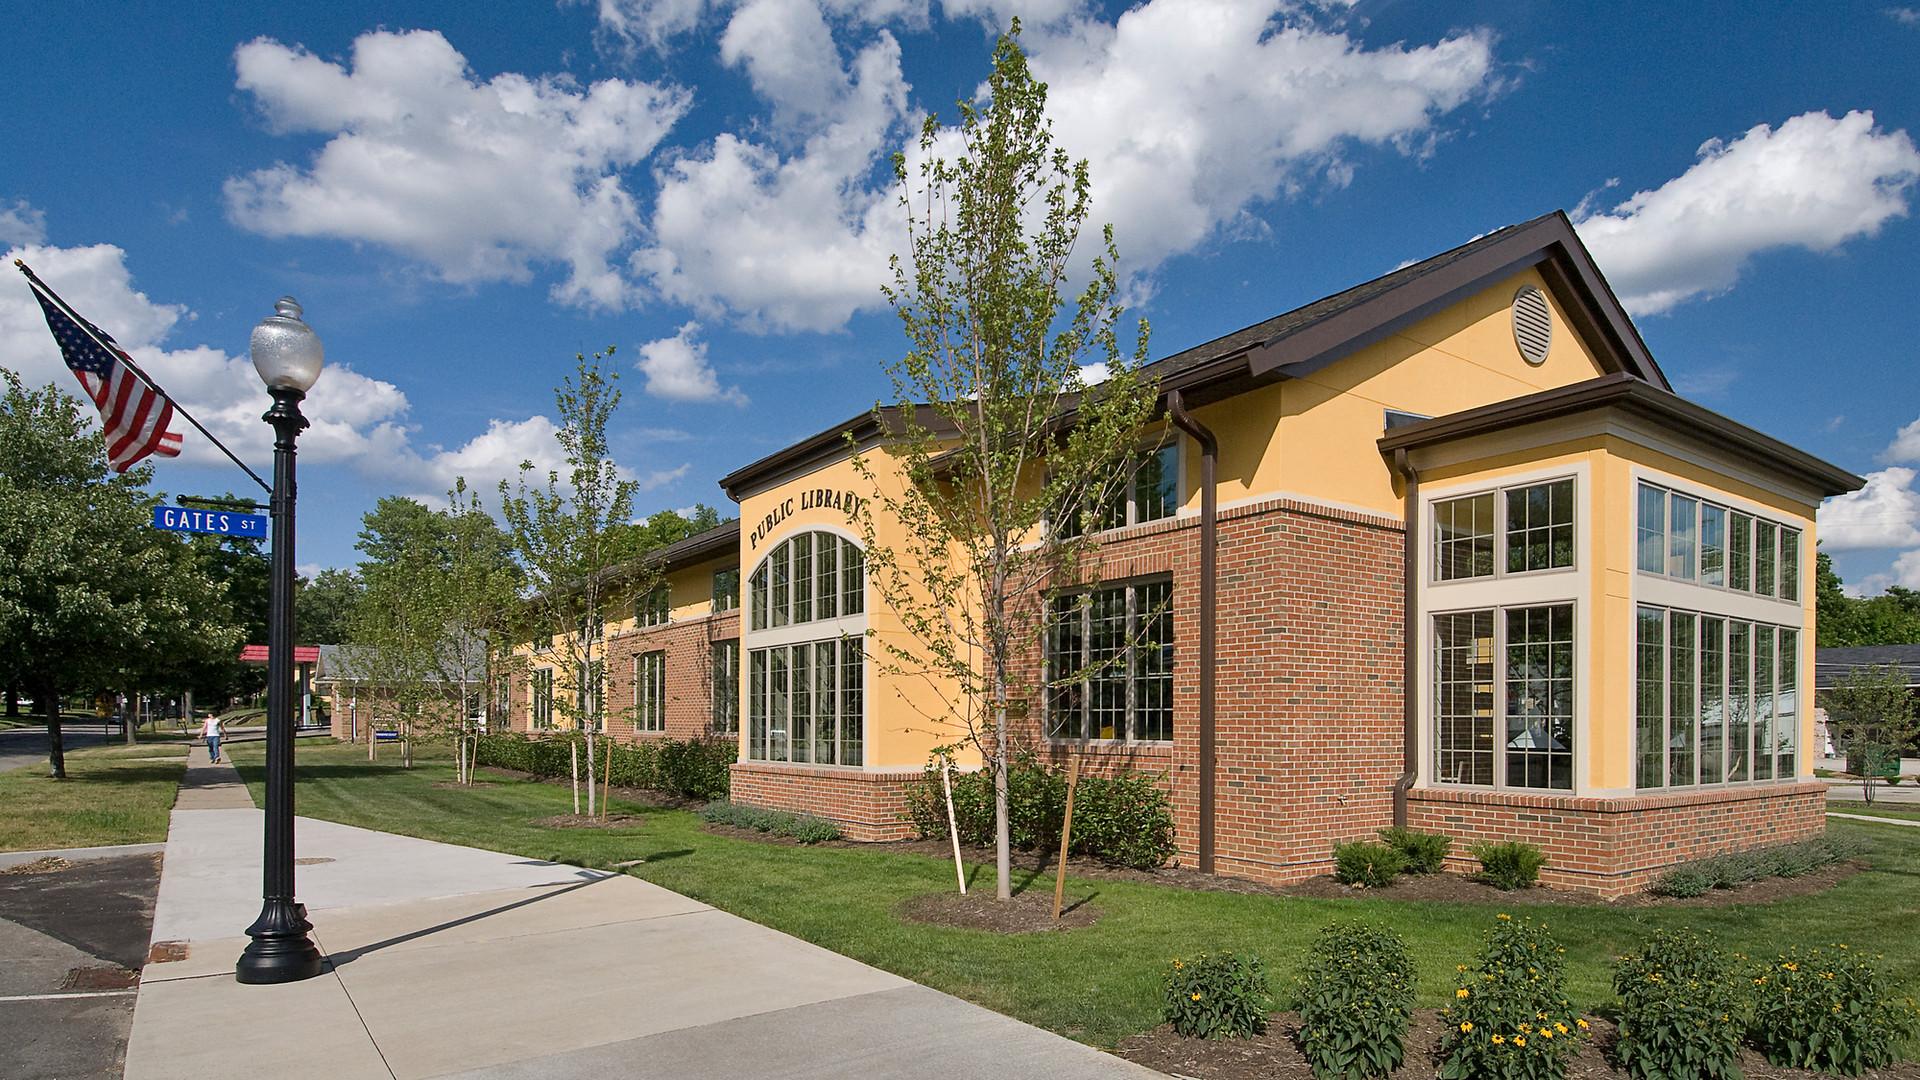 Doylestown Branch Wayne County Public Library